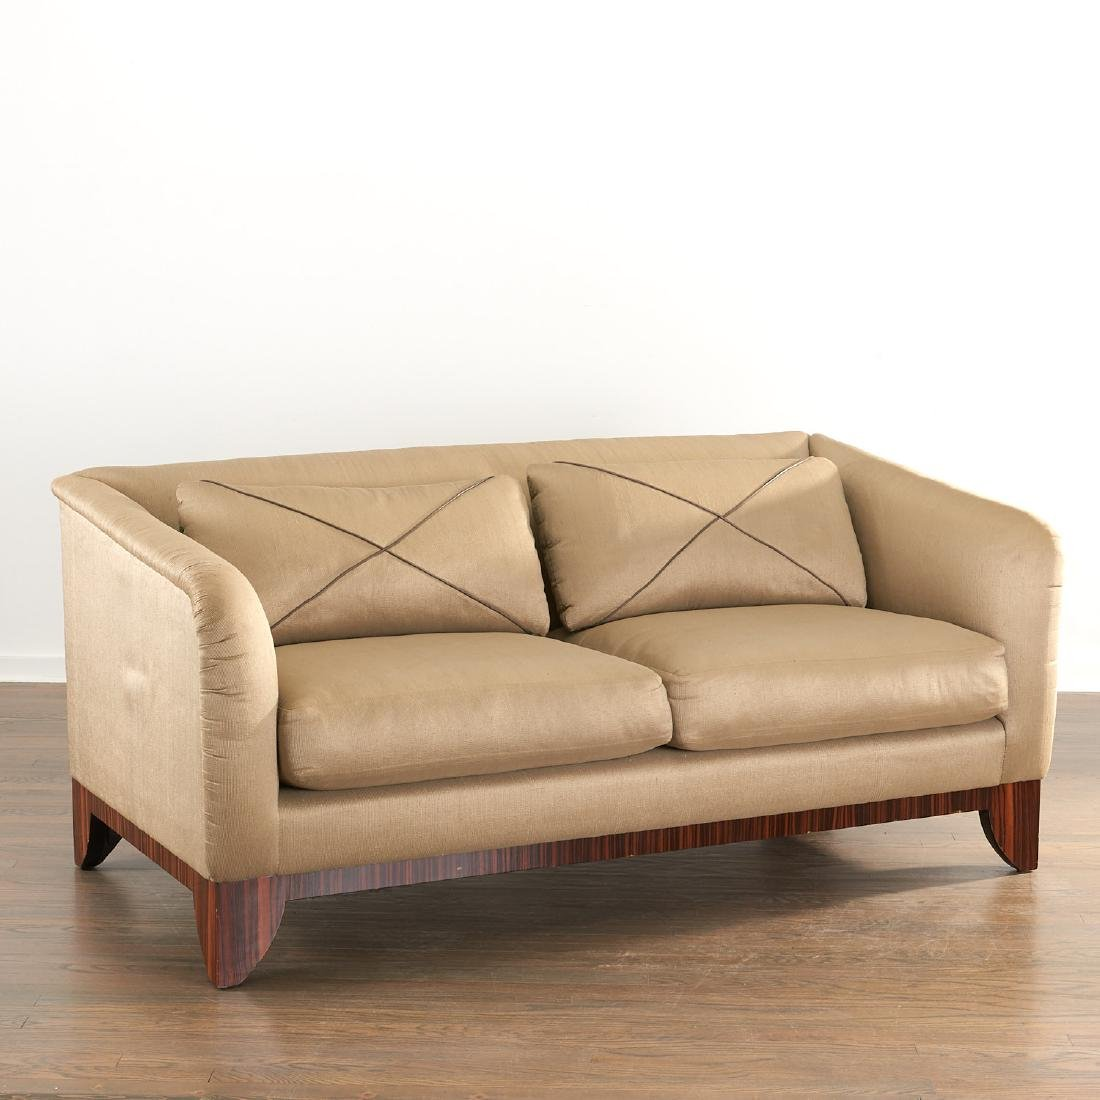 "J. Robert Scott ""Adrianna"" sofa"